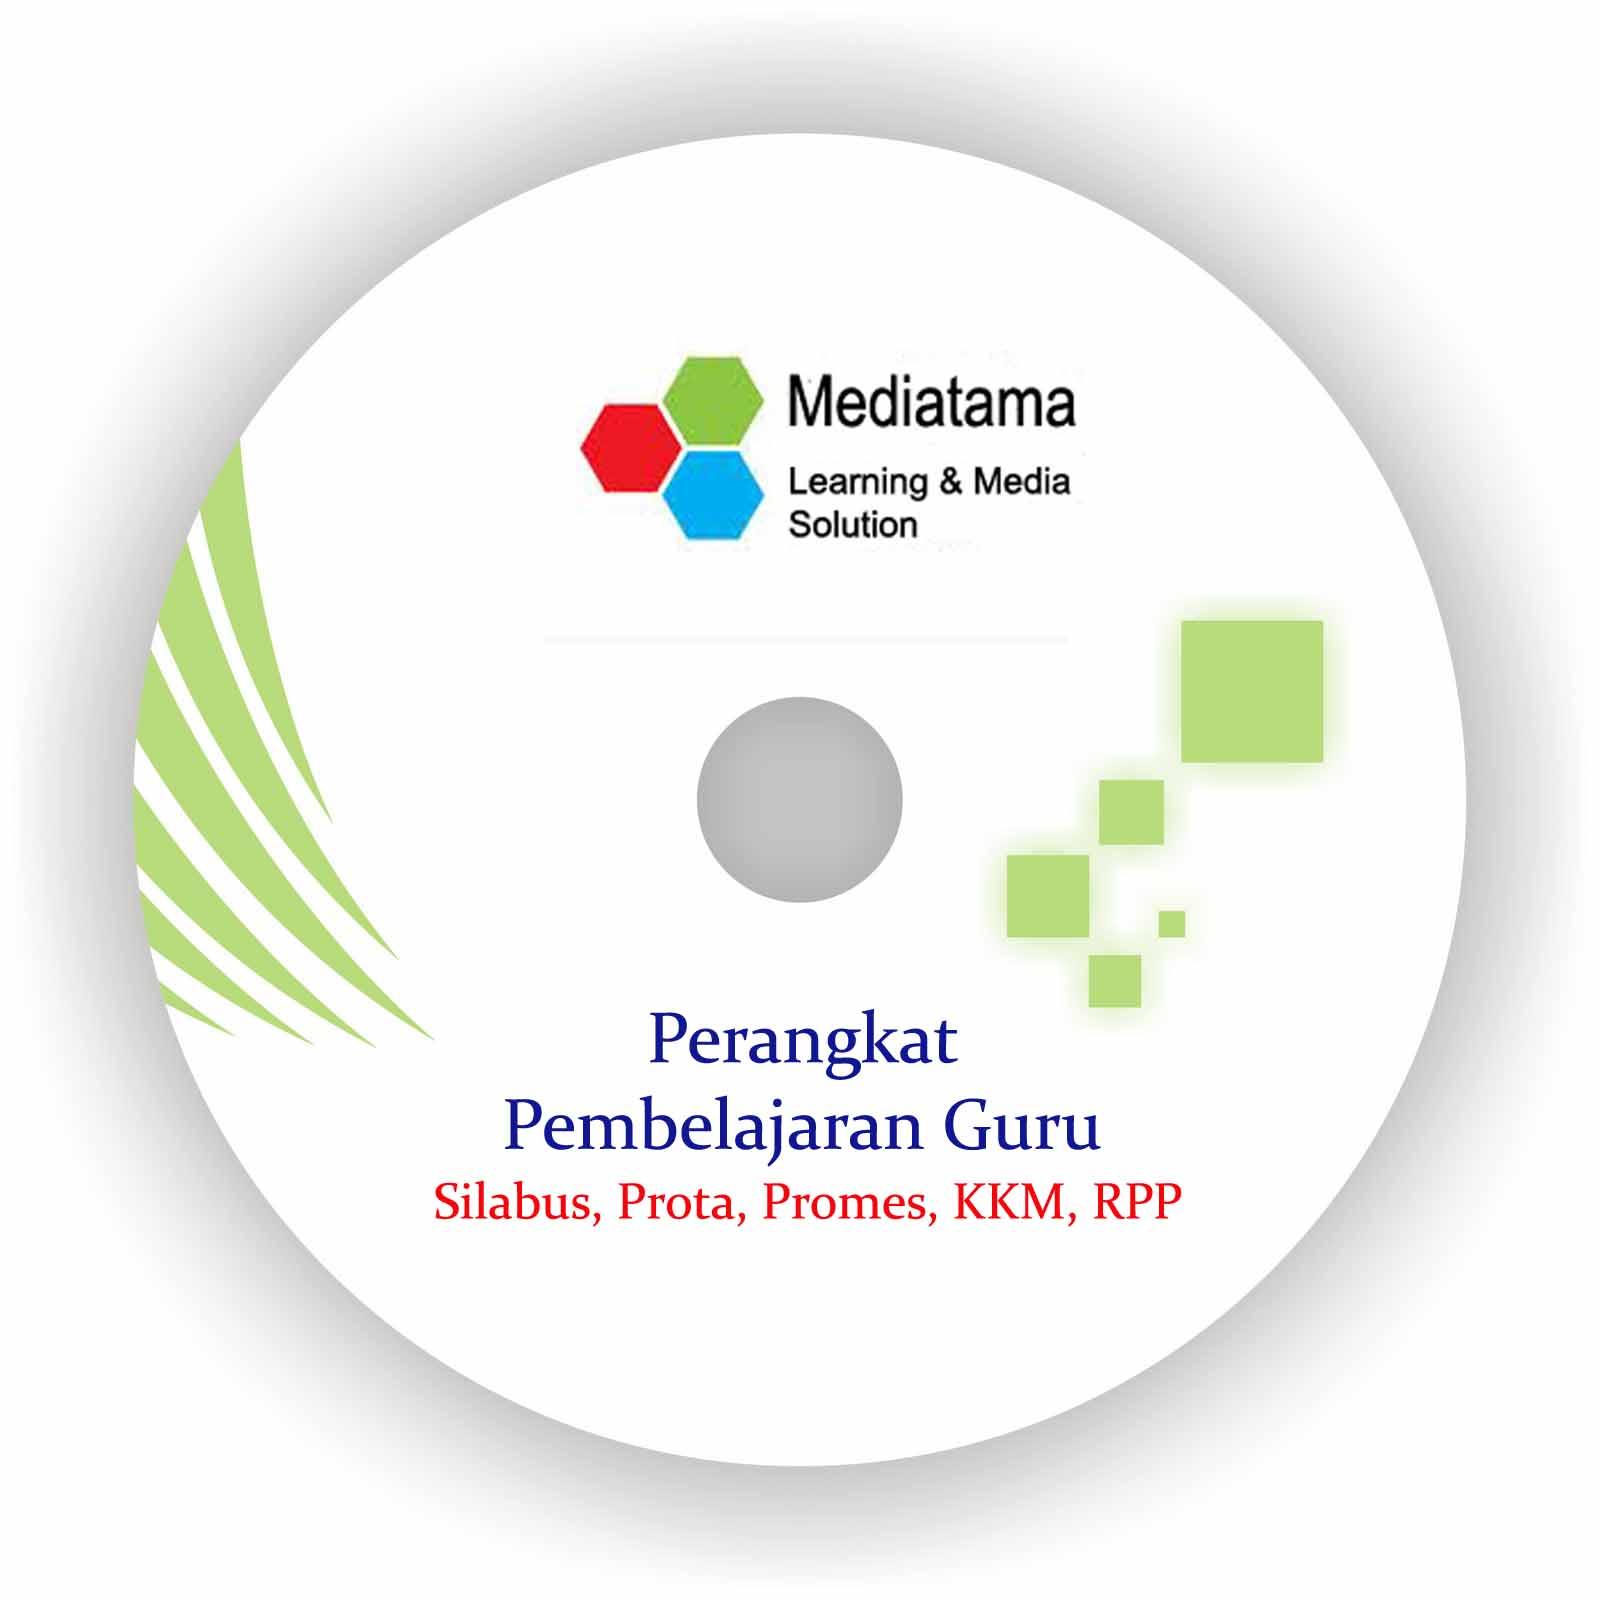 Rpp Sd Kelas Vi Media Guru Share The Knownledge